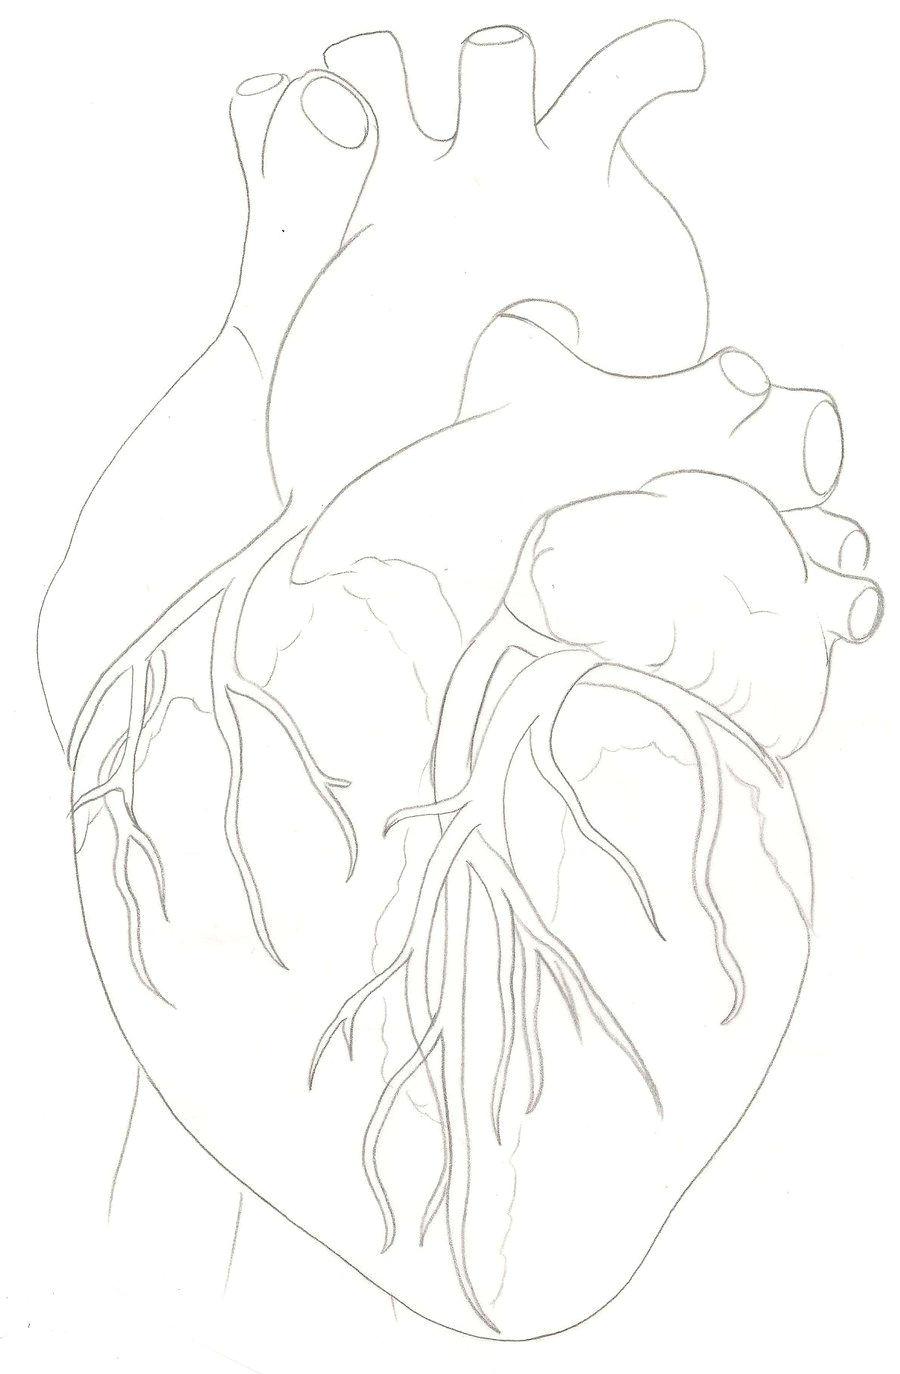 human heart tattoo by metacharis on deviantart